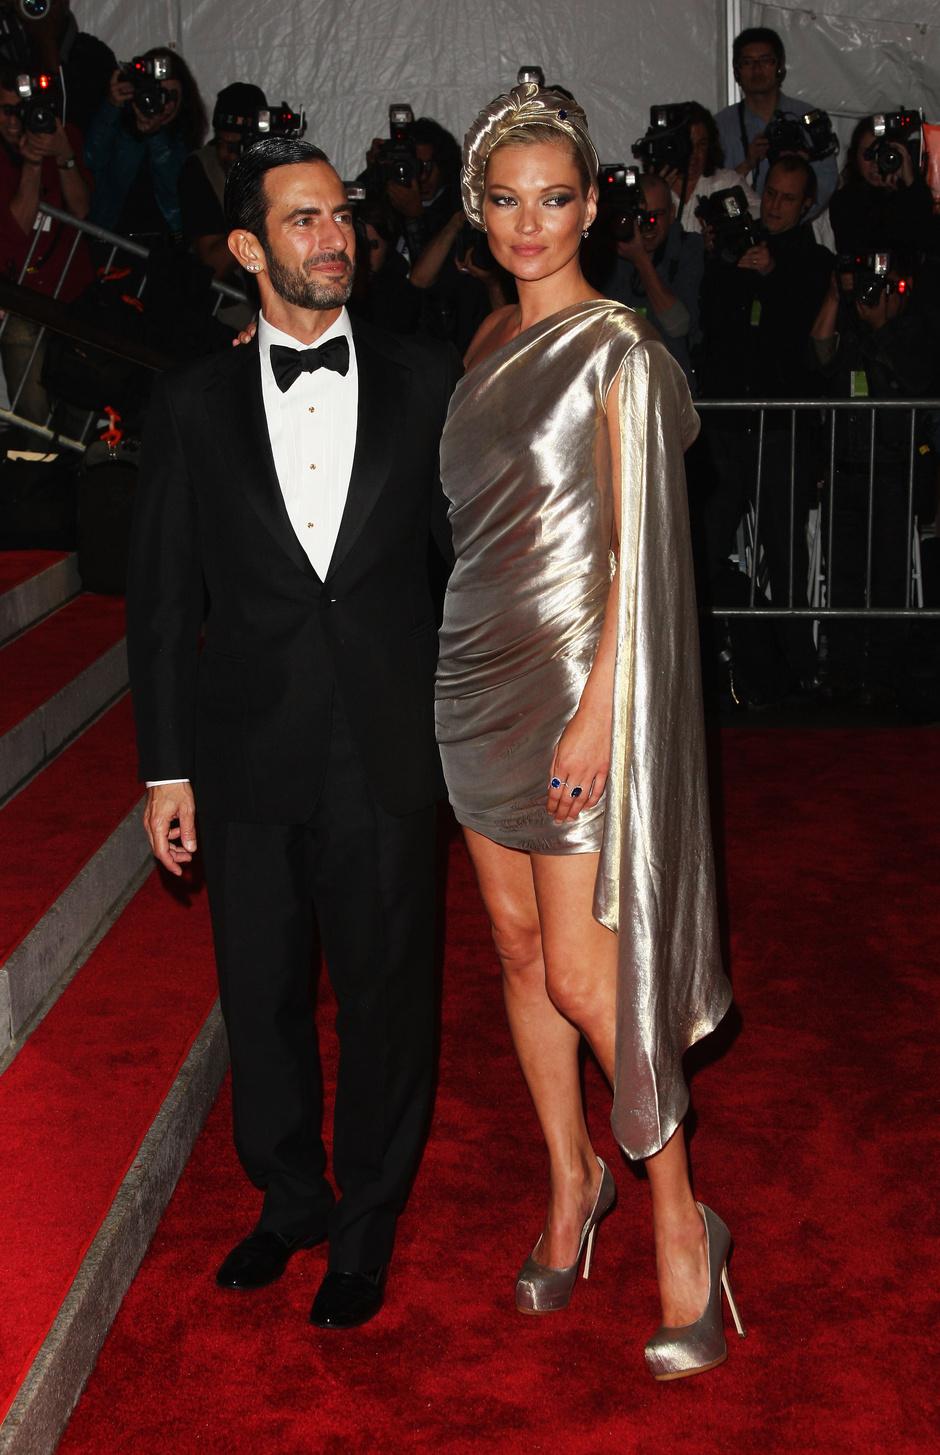 Марк Джейкобс и Кейт Мосс, 2009 год